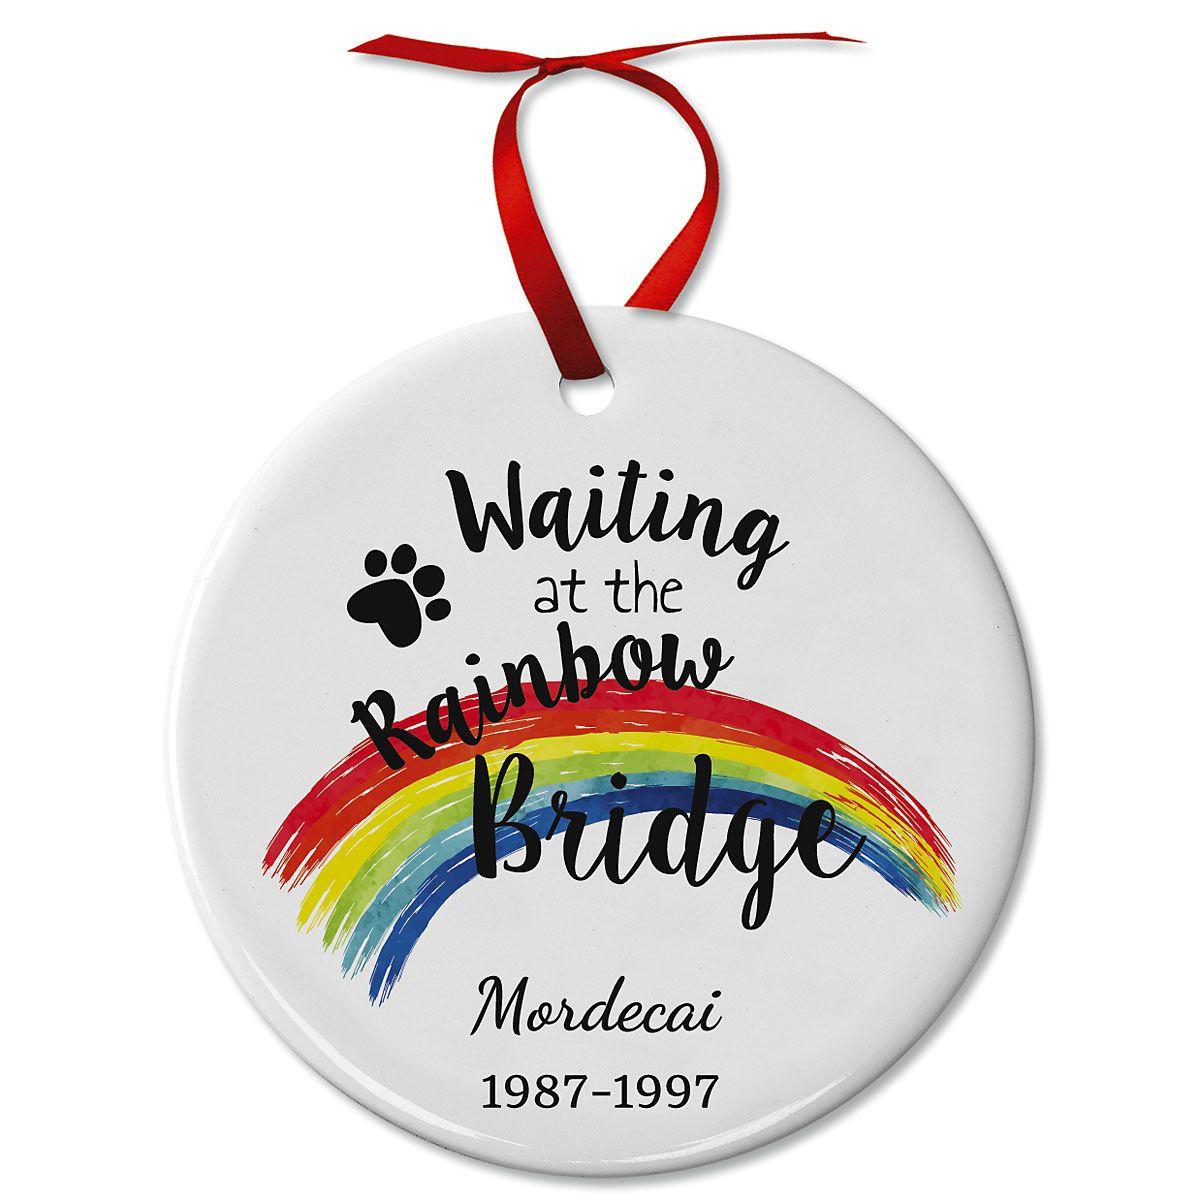 Pawprints Pet Remembrance Ceramic Personalized Christmas Ornament